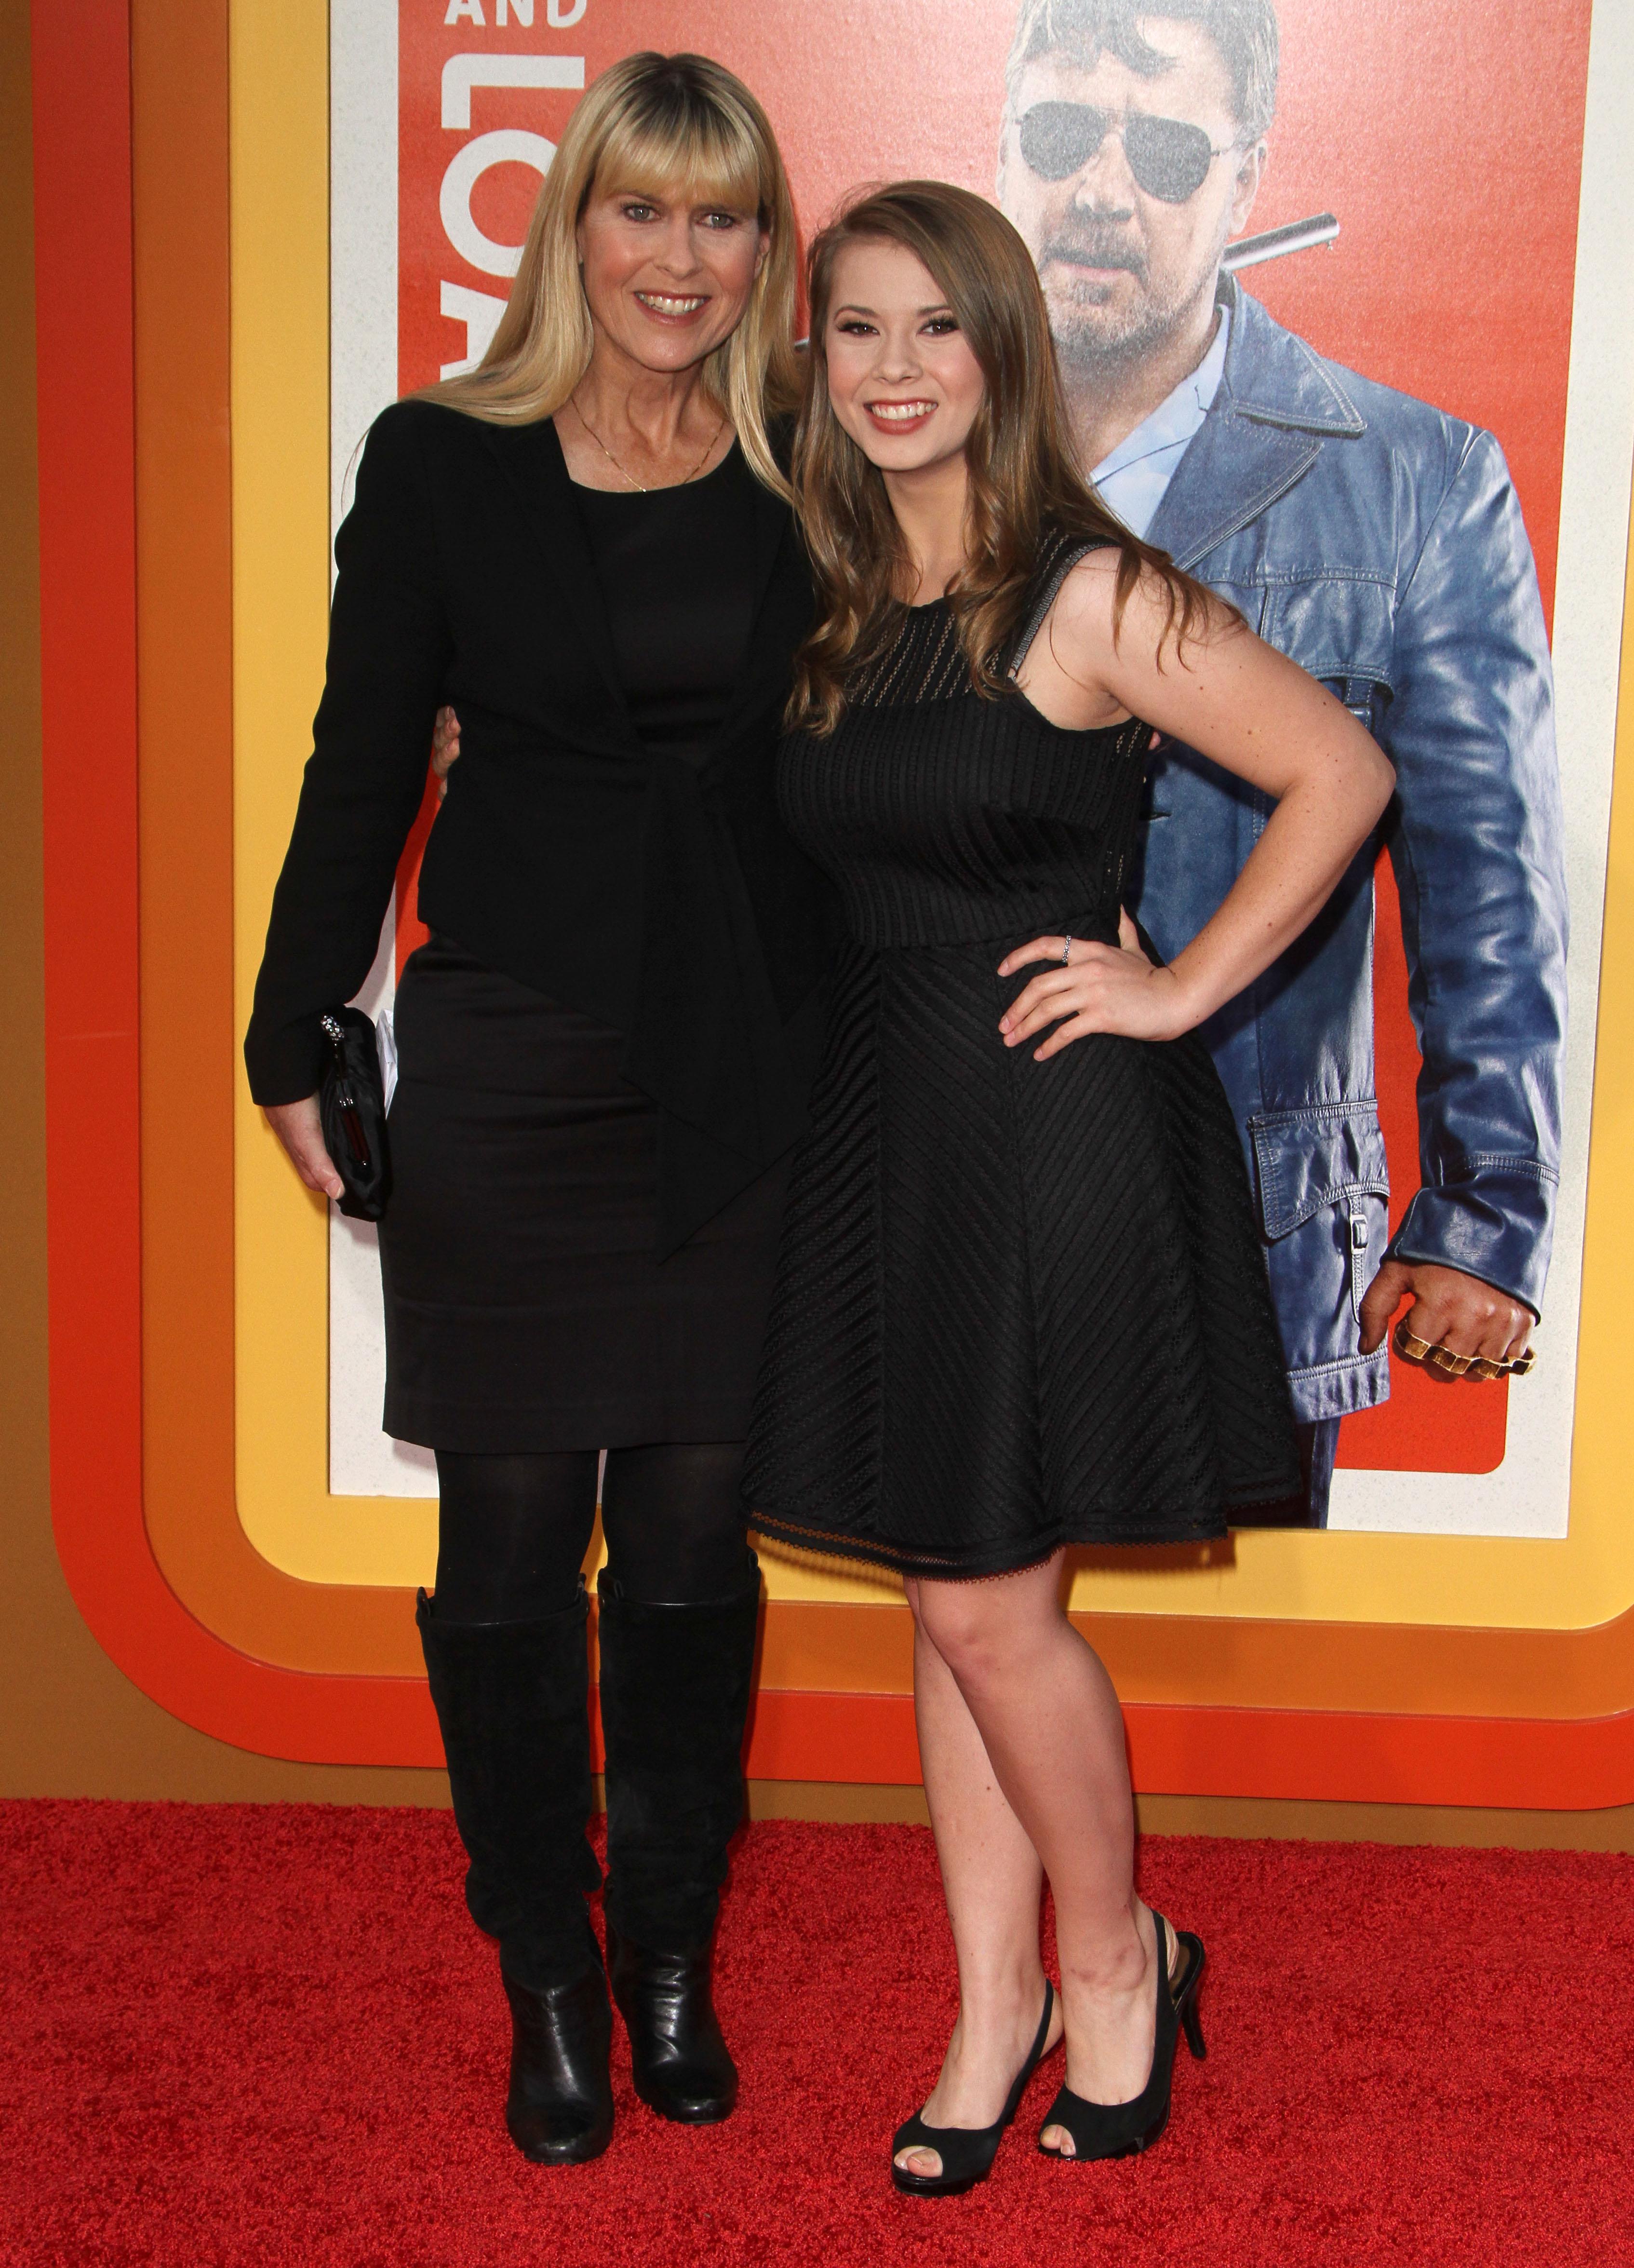 Terri Irwin and Russell Crowe Wedding: Trying to Beat Daughter Bindi Irwin Down the Aisle?